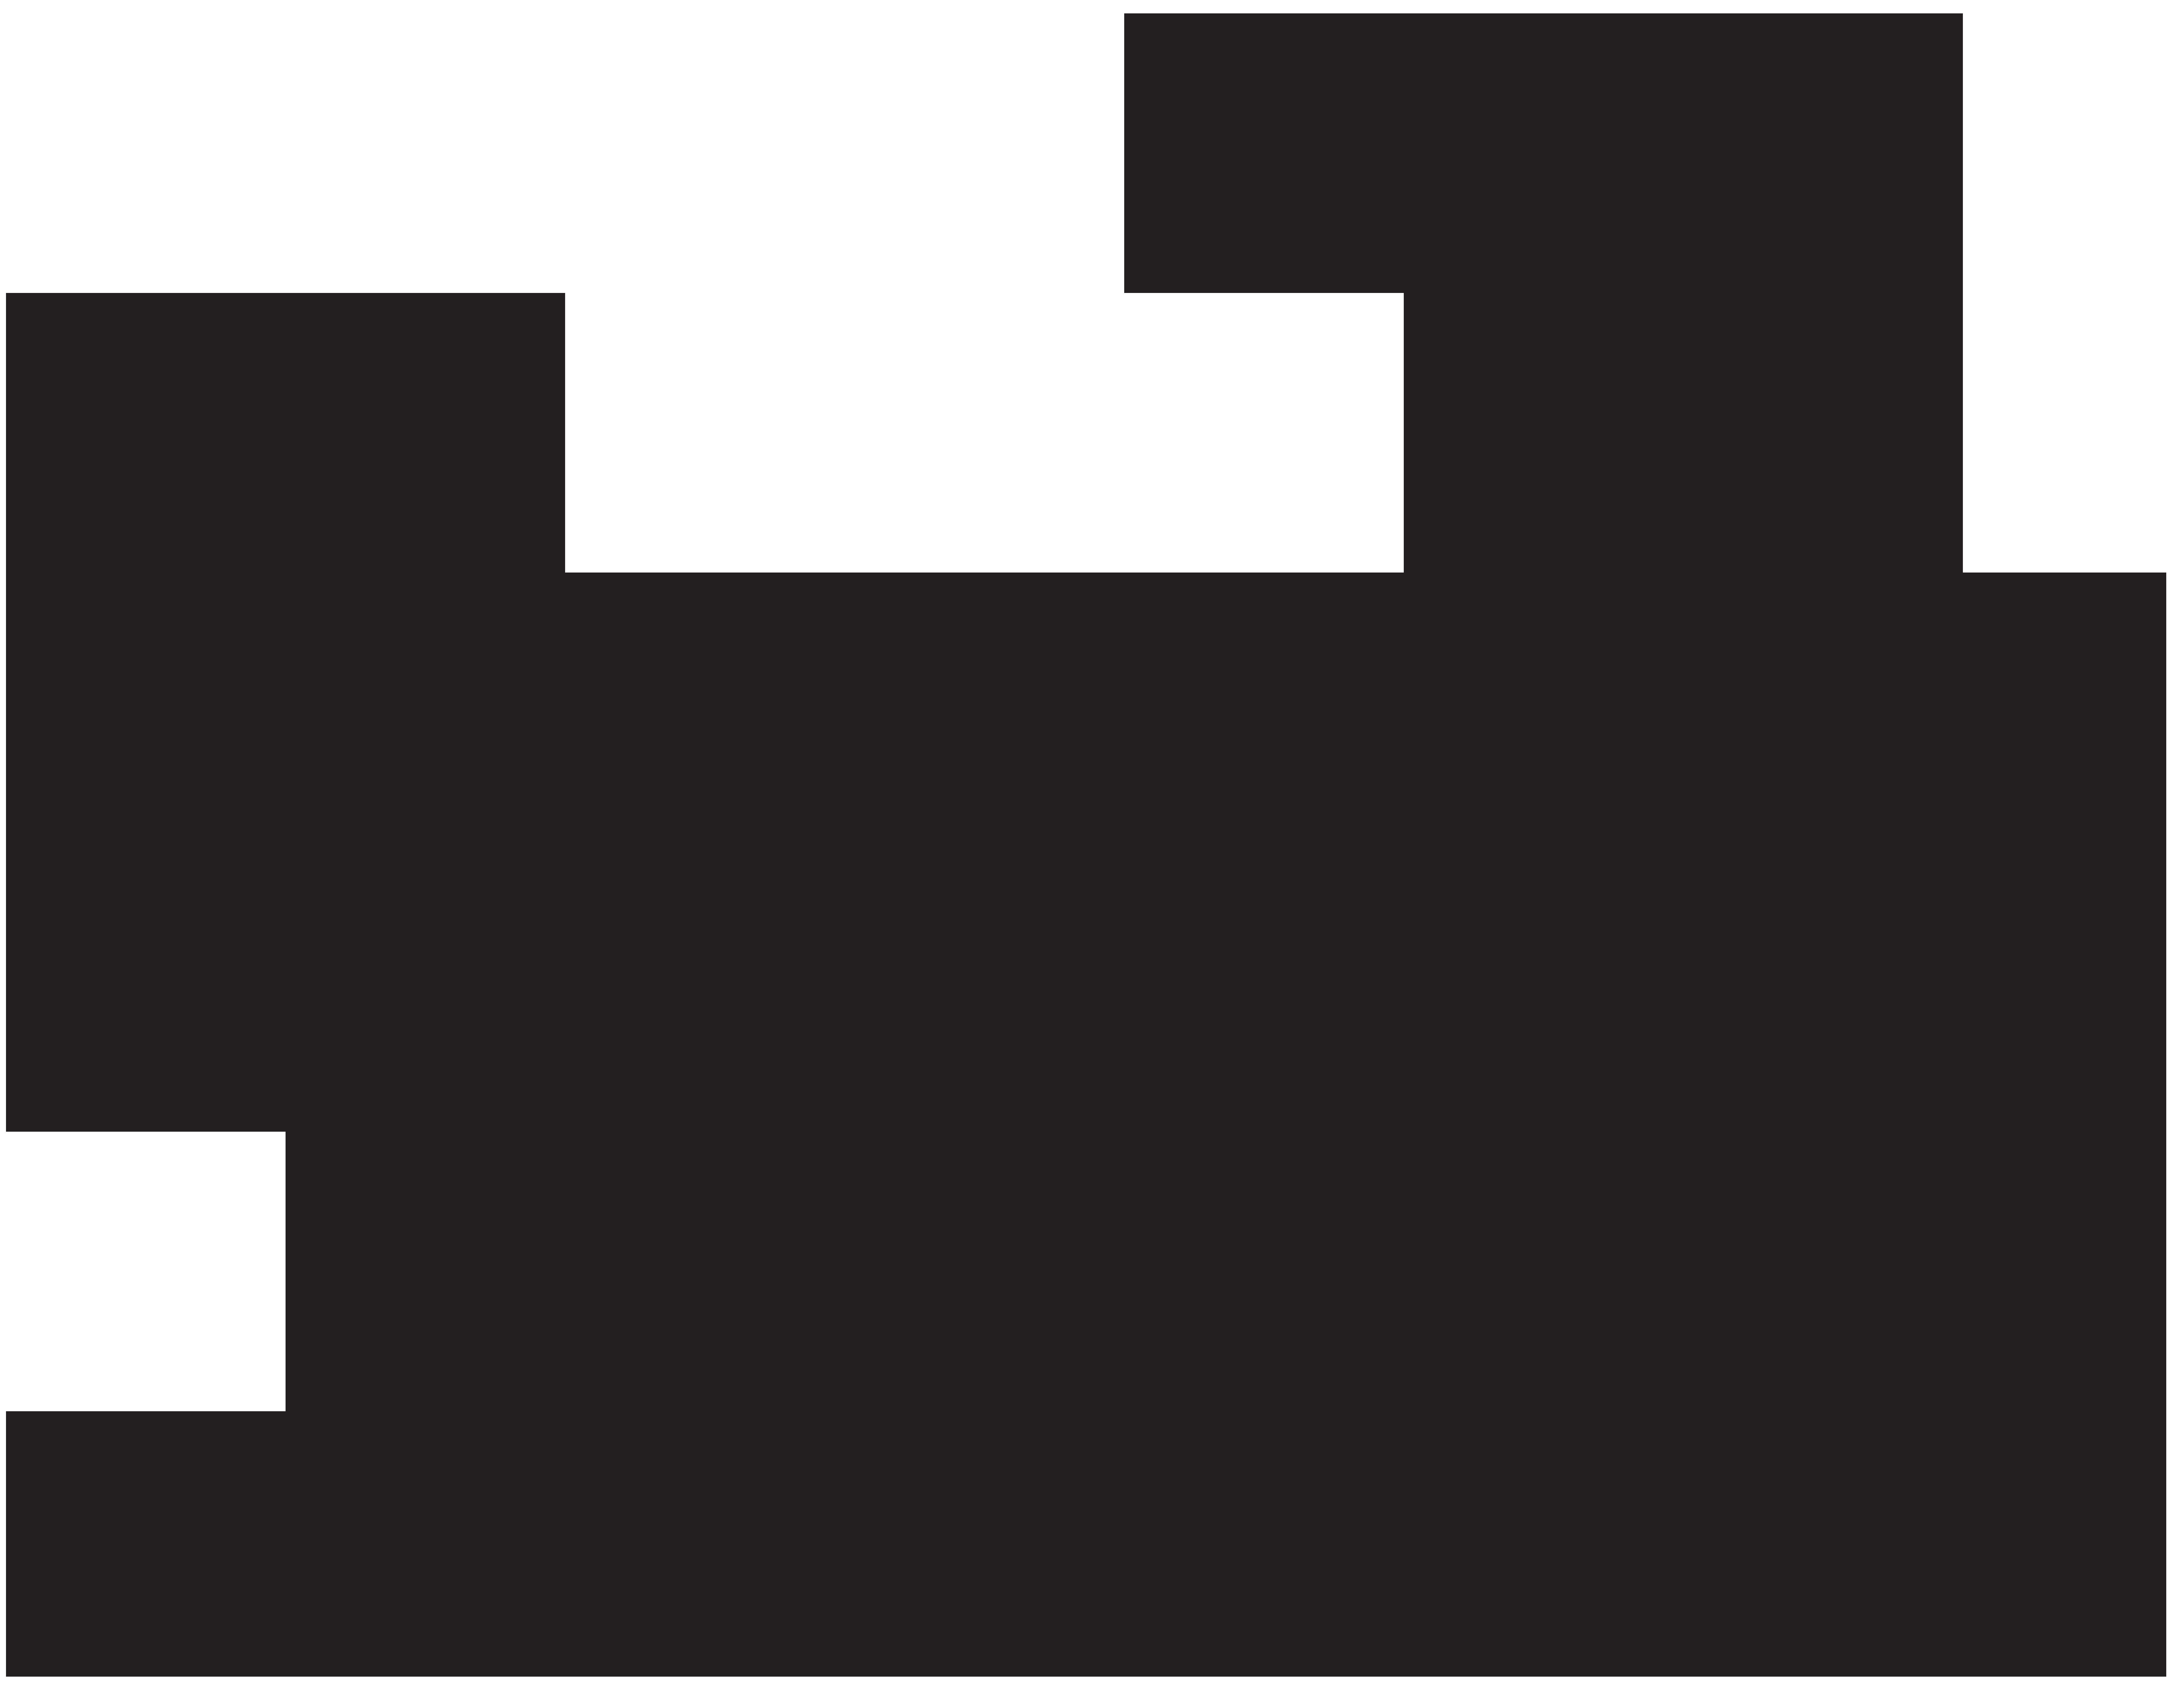 Kitten Silhouette PNG Clip Art Image.